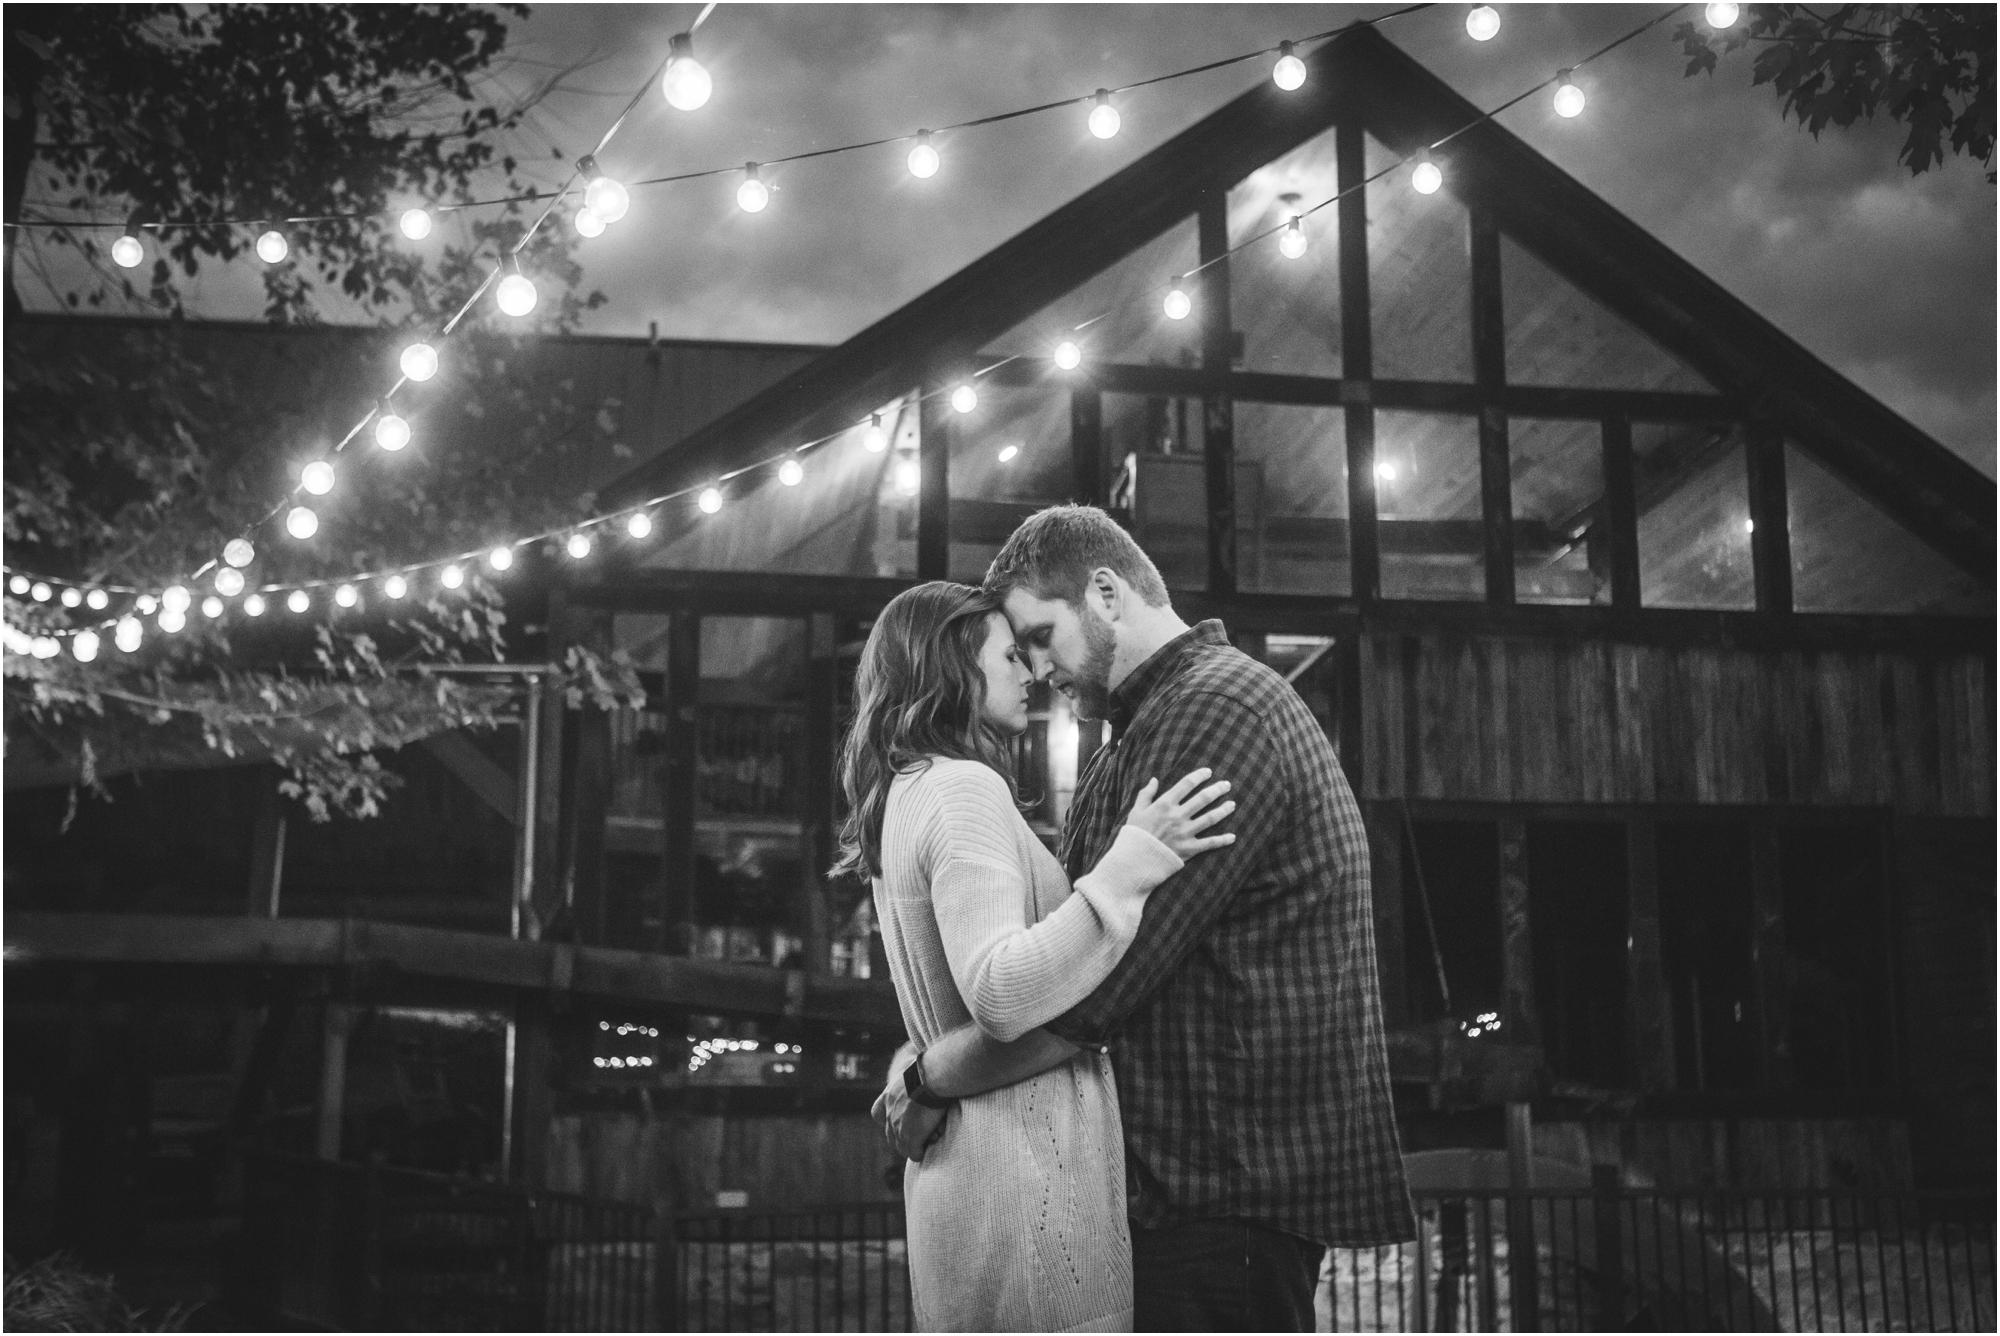 katy-sergent-millstone-limestone-tn-rustic-fall-engagement-session-adventurous-outdoors-intimate-elopement-wedding-northeast-johnson-city-photographer_0045.jpg